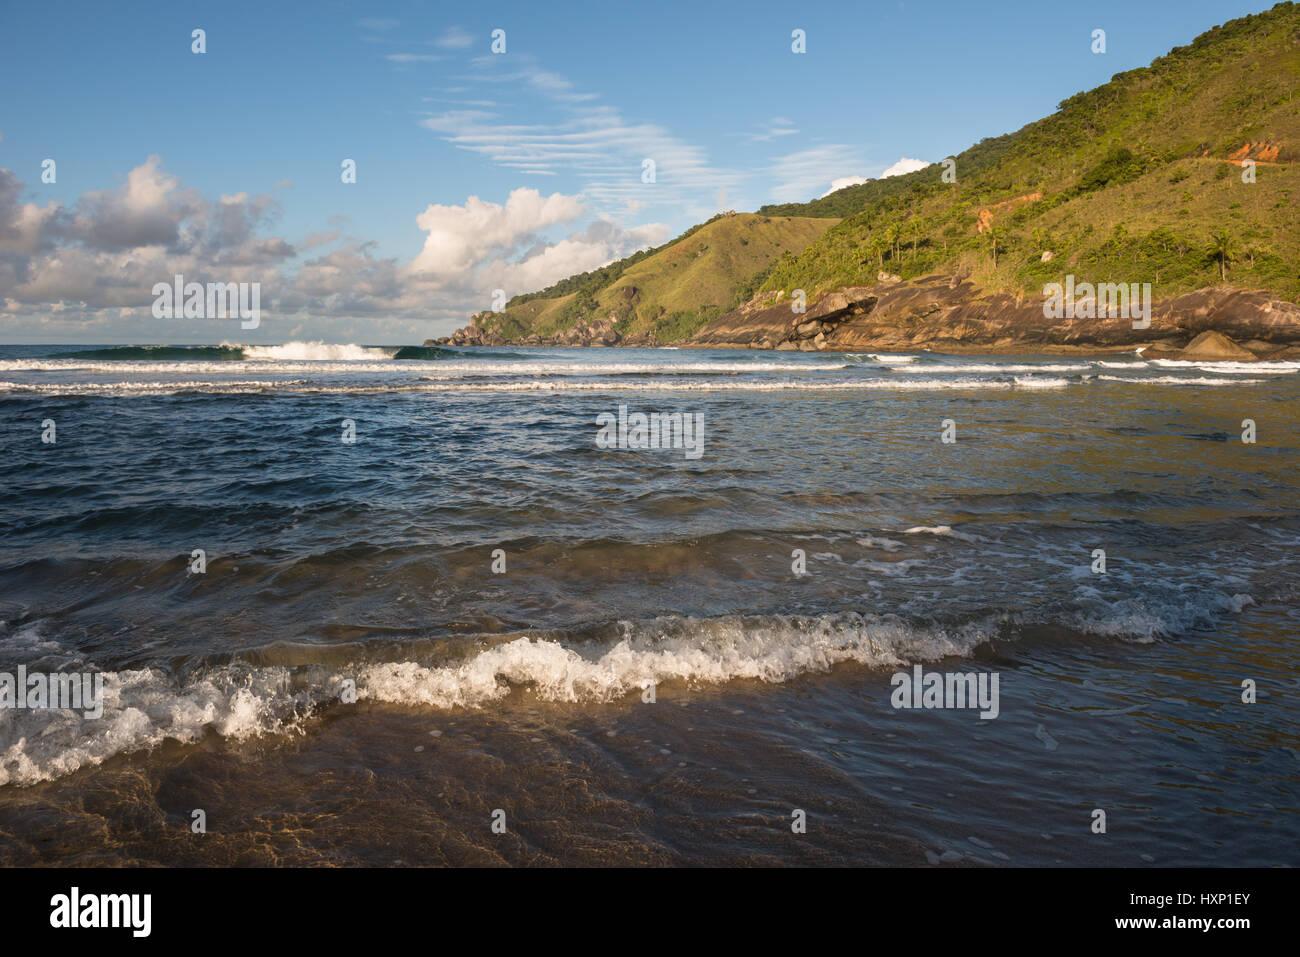 Bonete Beach in Ilhabela, Brazil Stock Photo